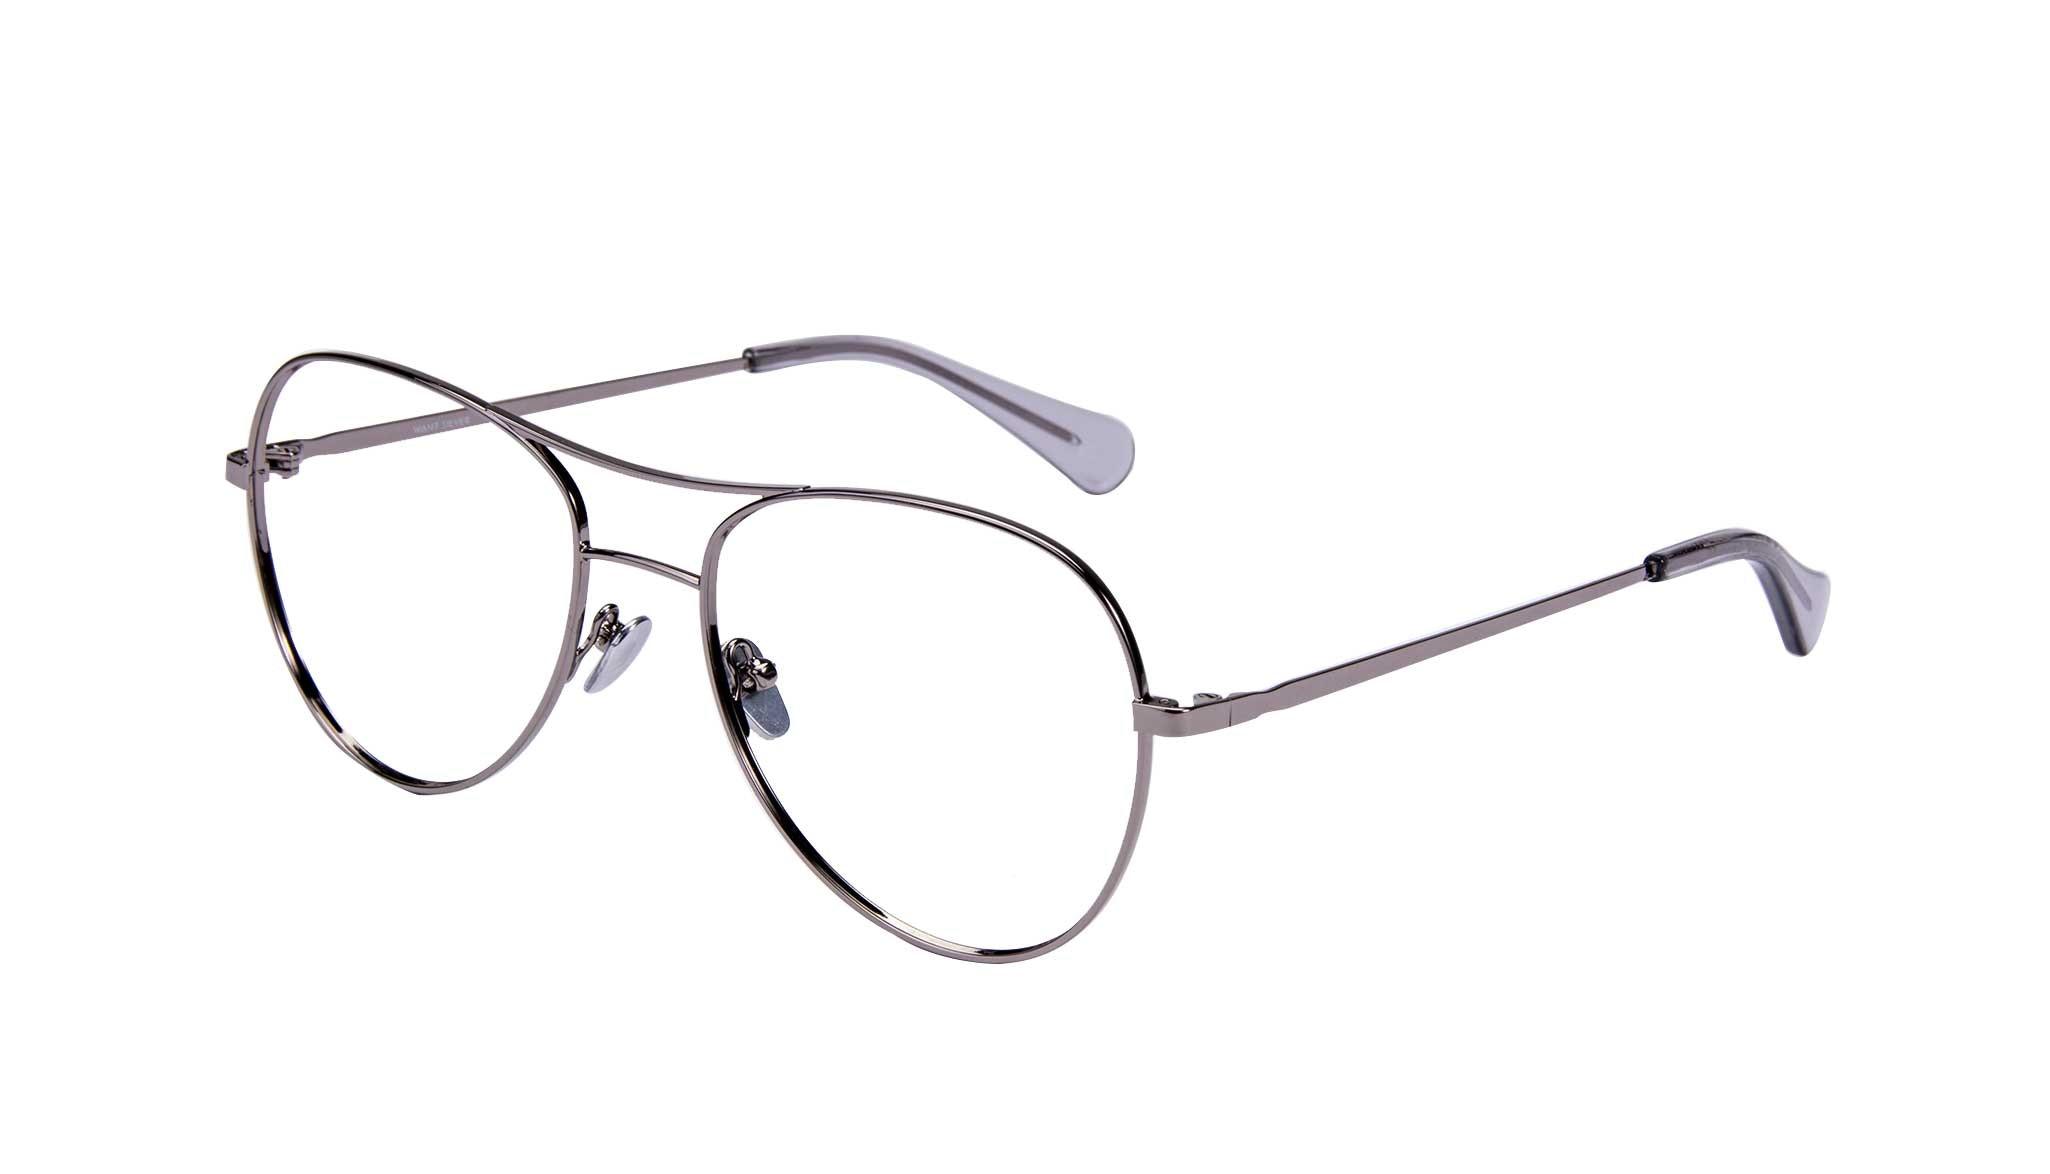 Affordable Fashion Glasses Aviator Eyeglasses Women Want Silver Tilt